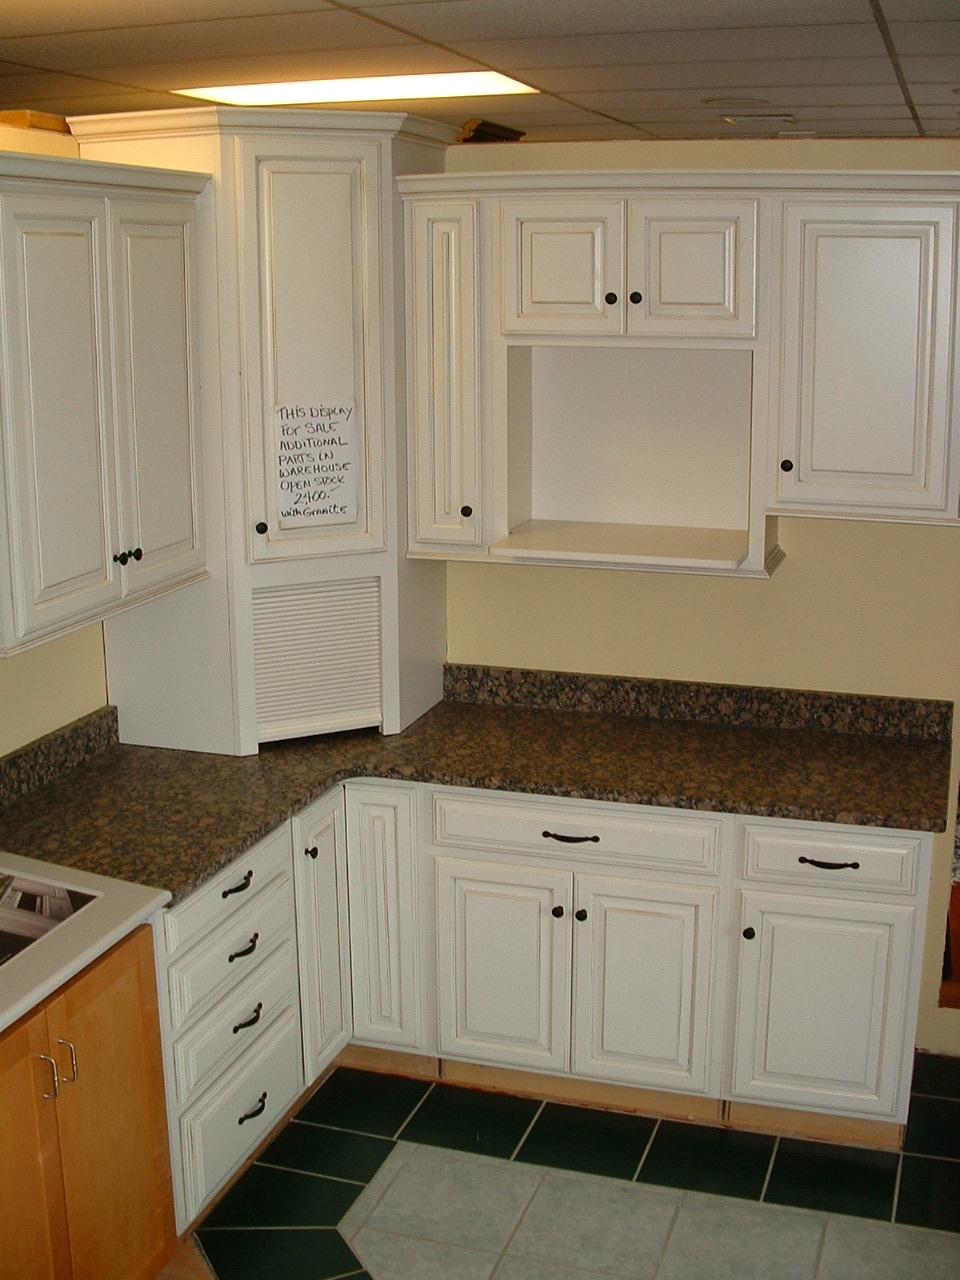 compeititve kitchen designs in home competitive kitchen design miserv